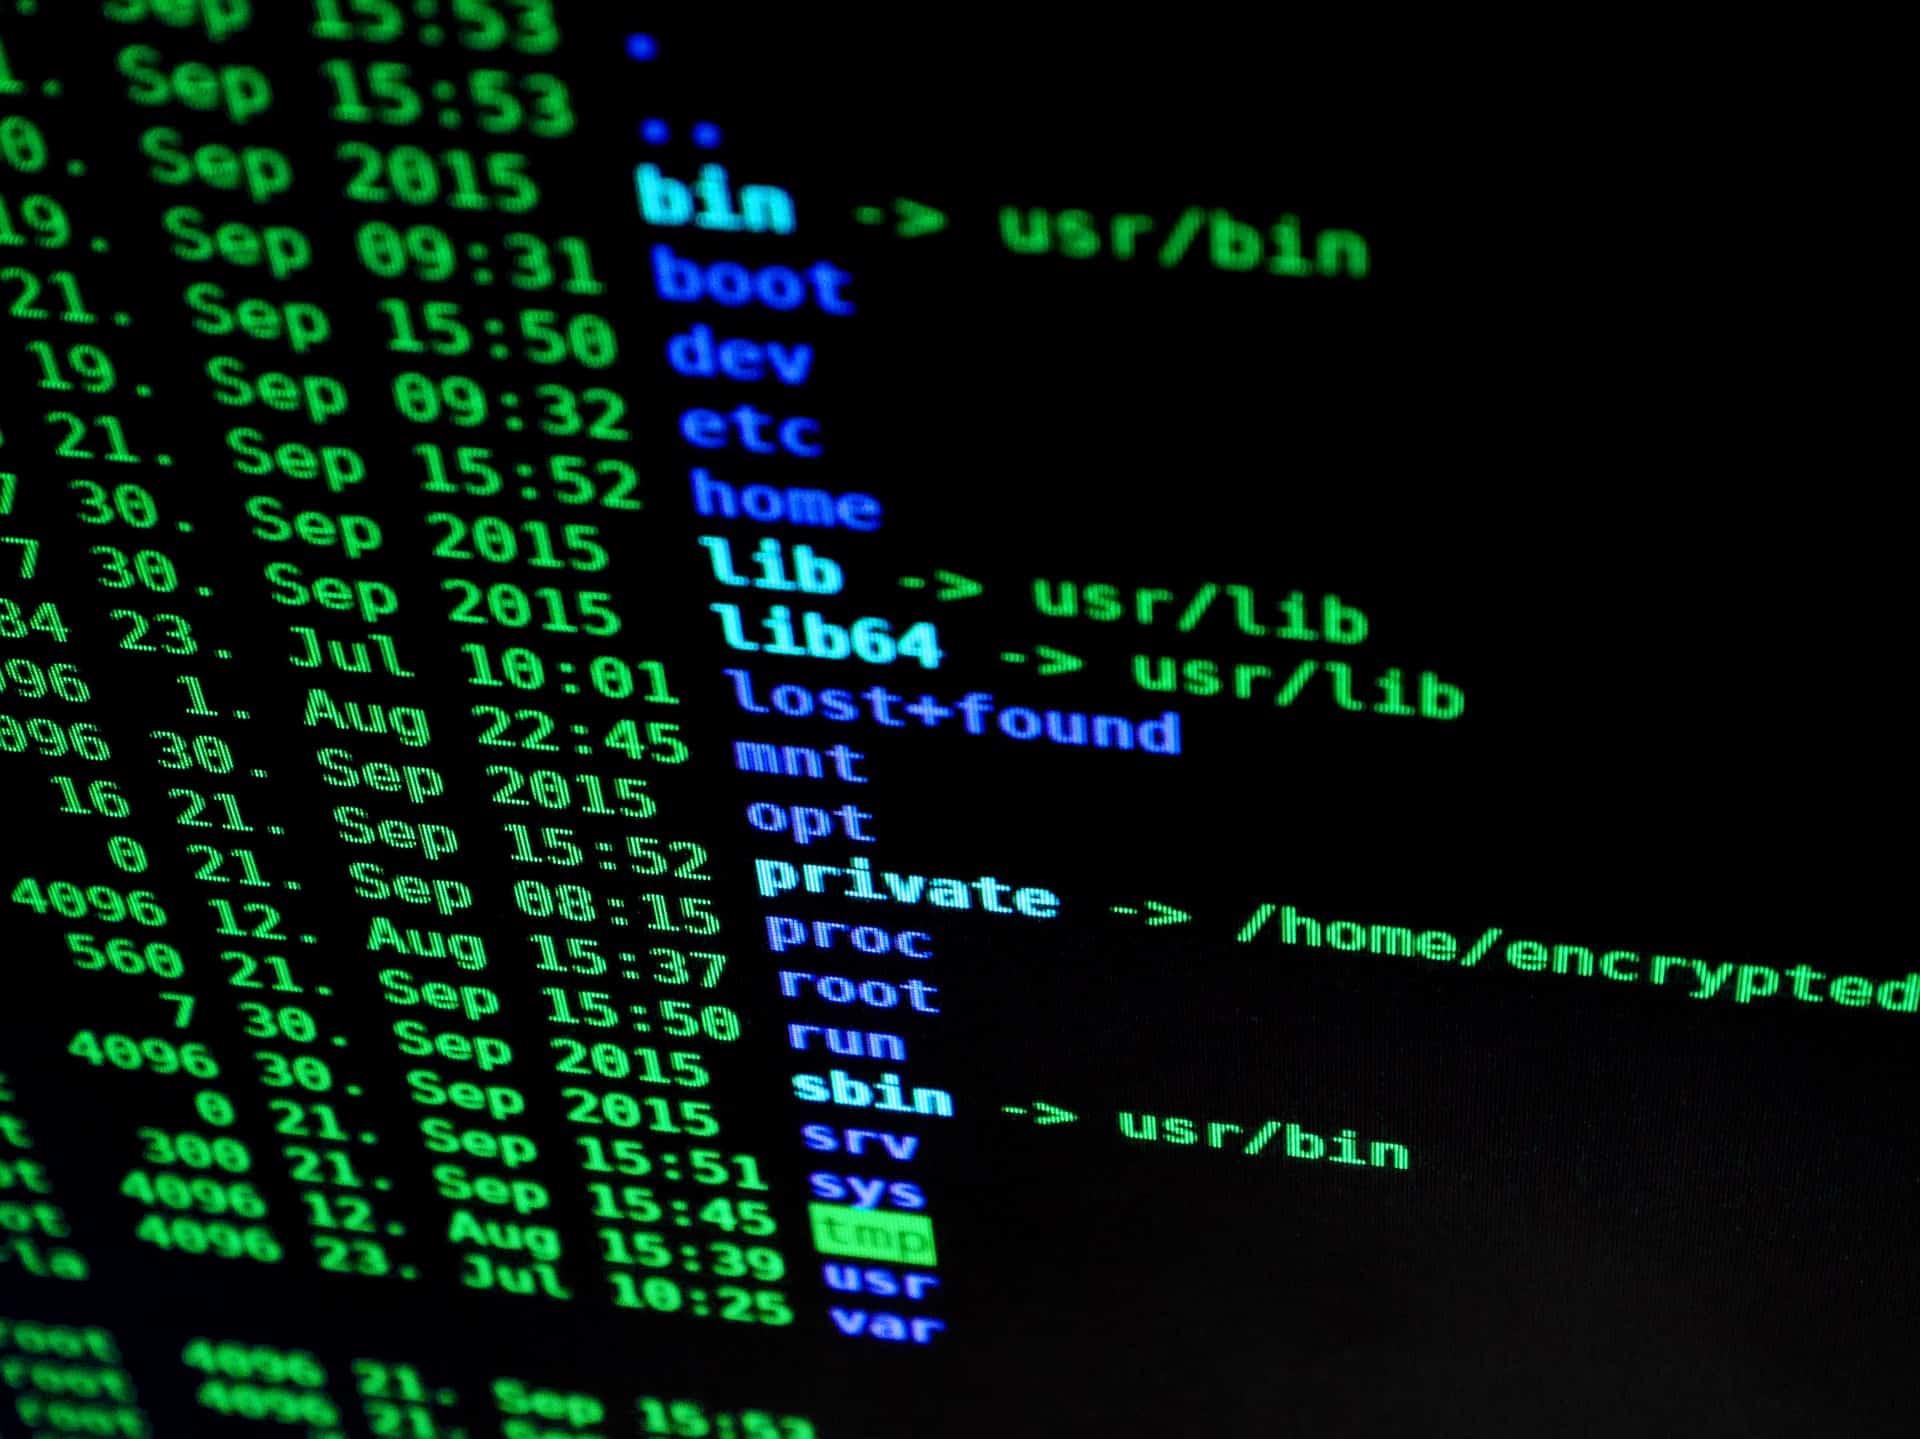 Symlink, php, unzip, system, hackowanie